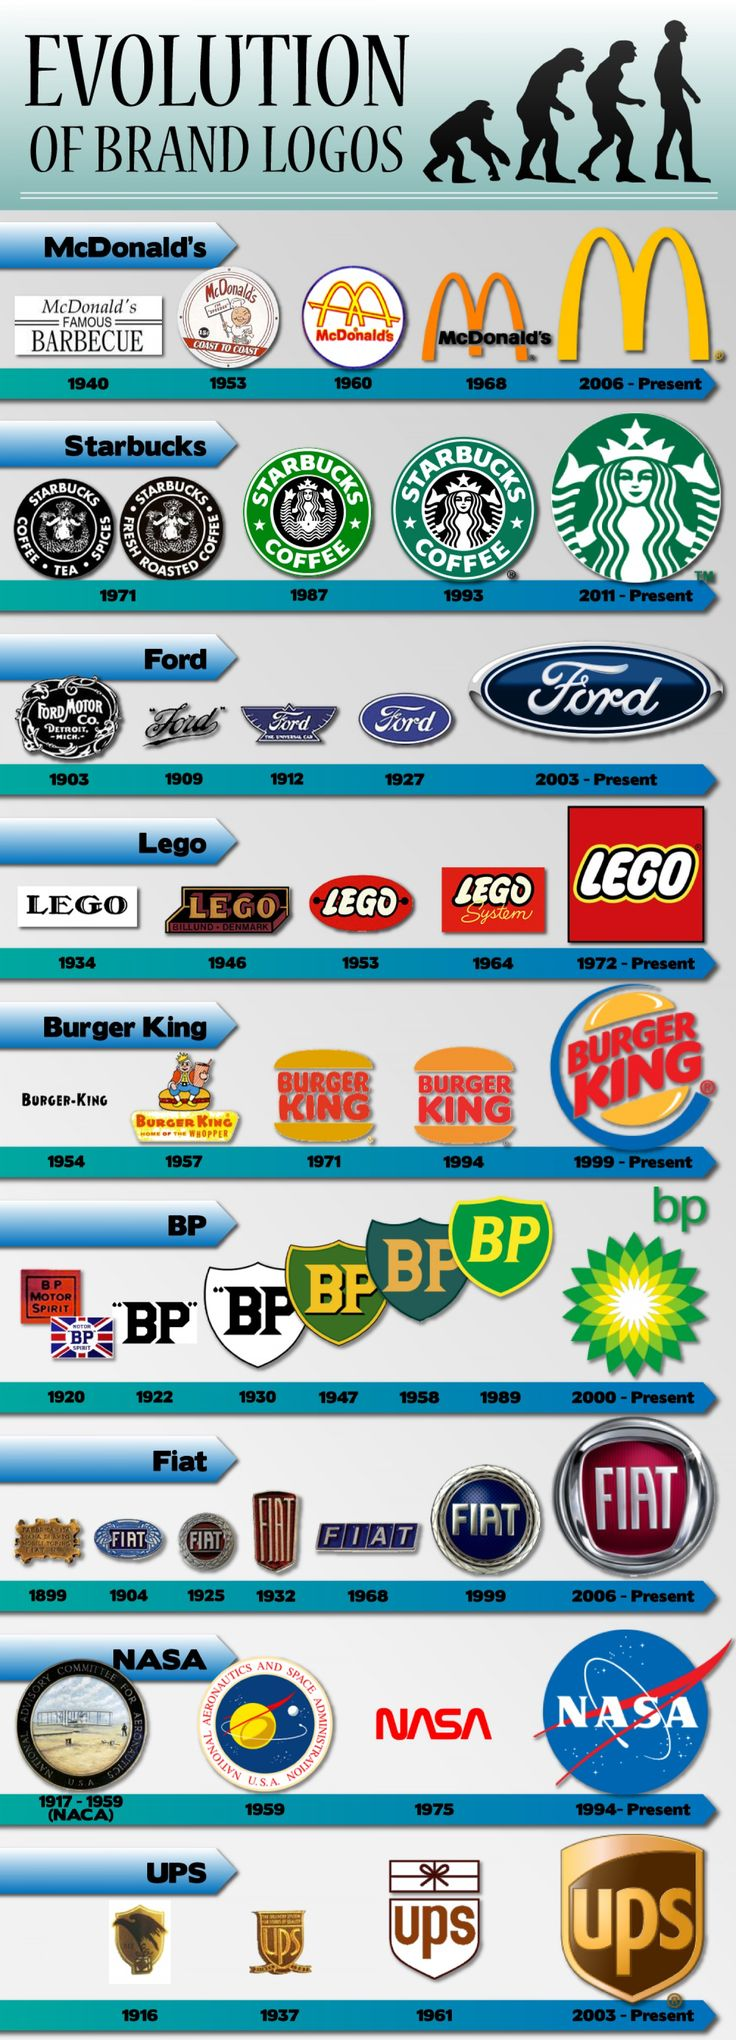 Evolution of brand logos